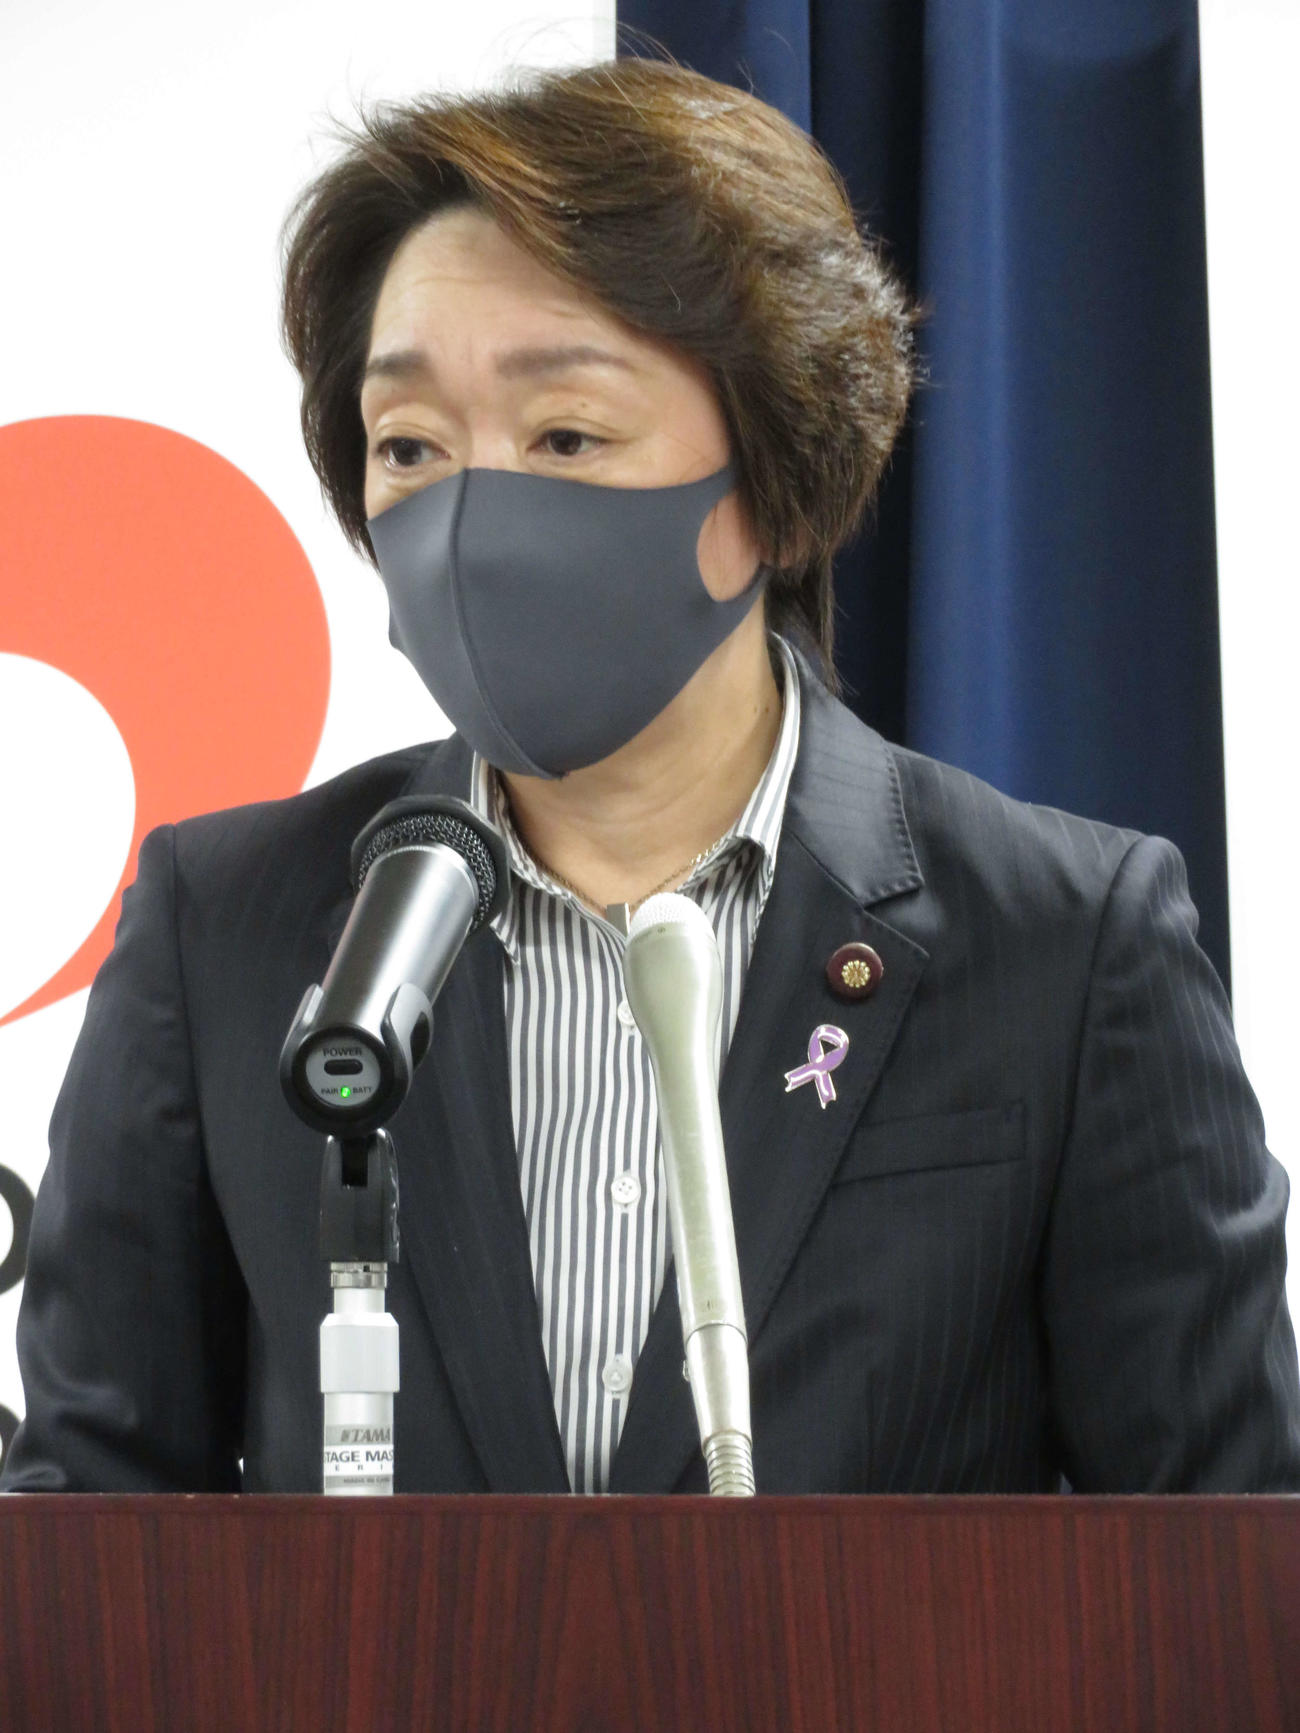 閣議後会見を行った橋本聖子五輪相(2020年11月20日)(撮影・近藤由美子)